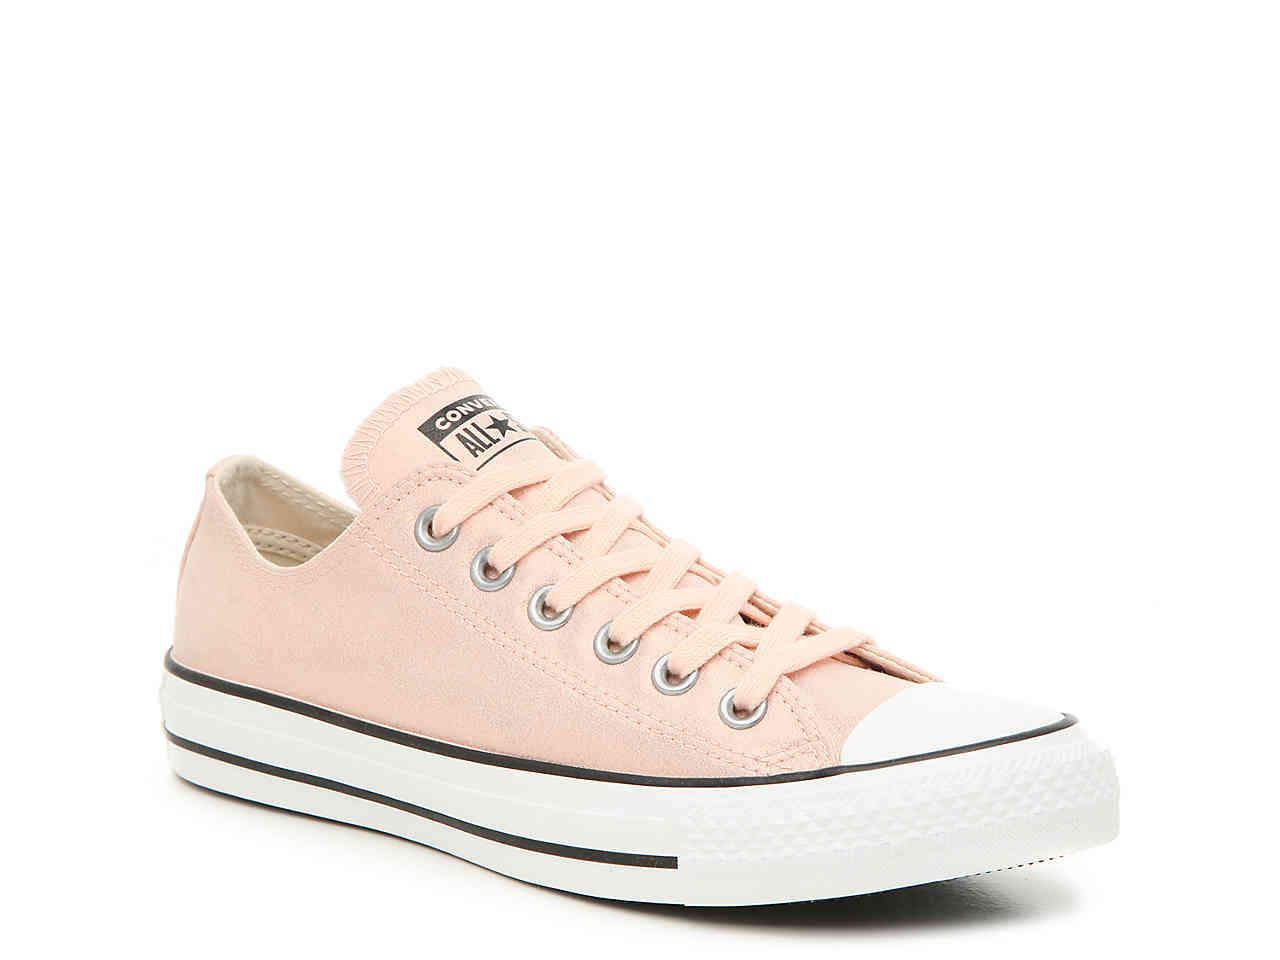 564d758d73e78f Lyst - Converse Chuck Taylor All Star Twilight Sneaker in Pink